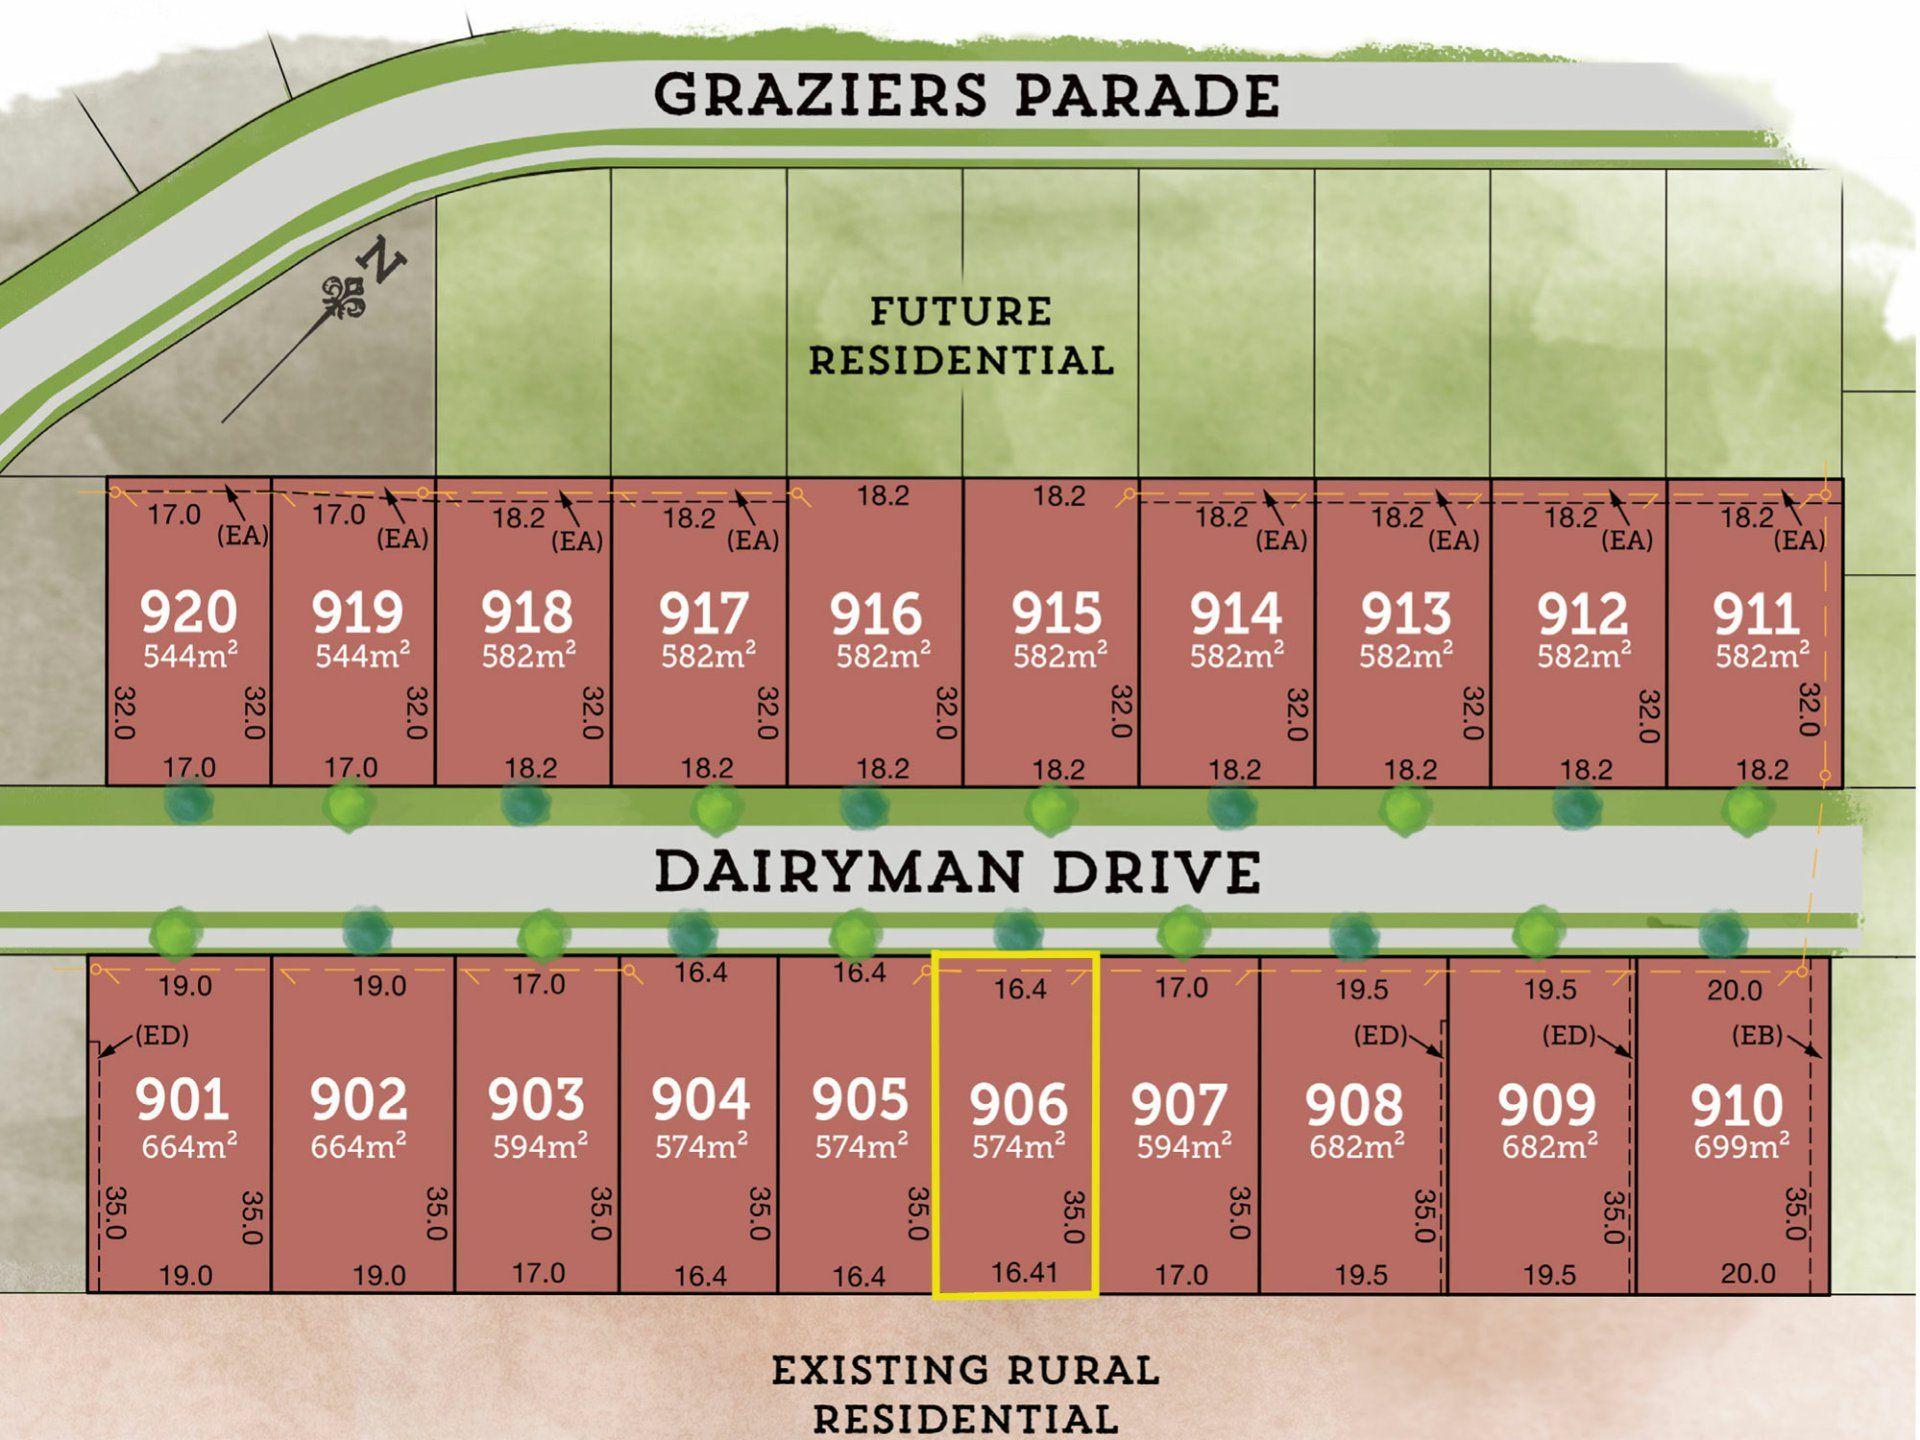 906 Dairyman Drive RAYMOND TERRACE 2324